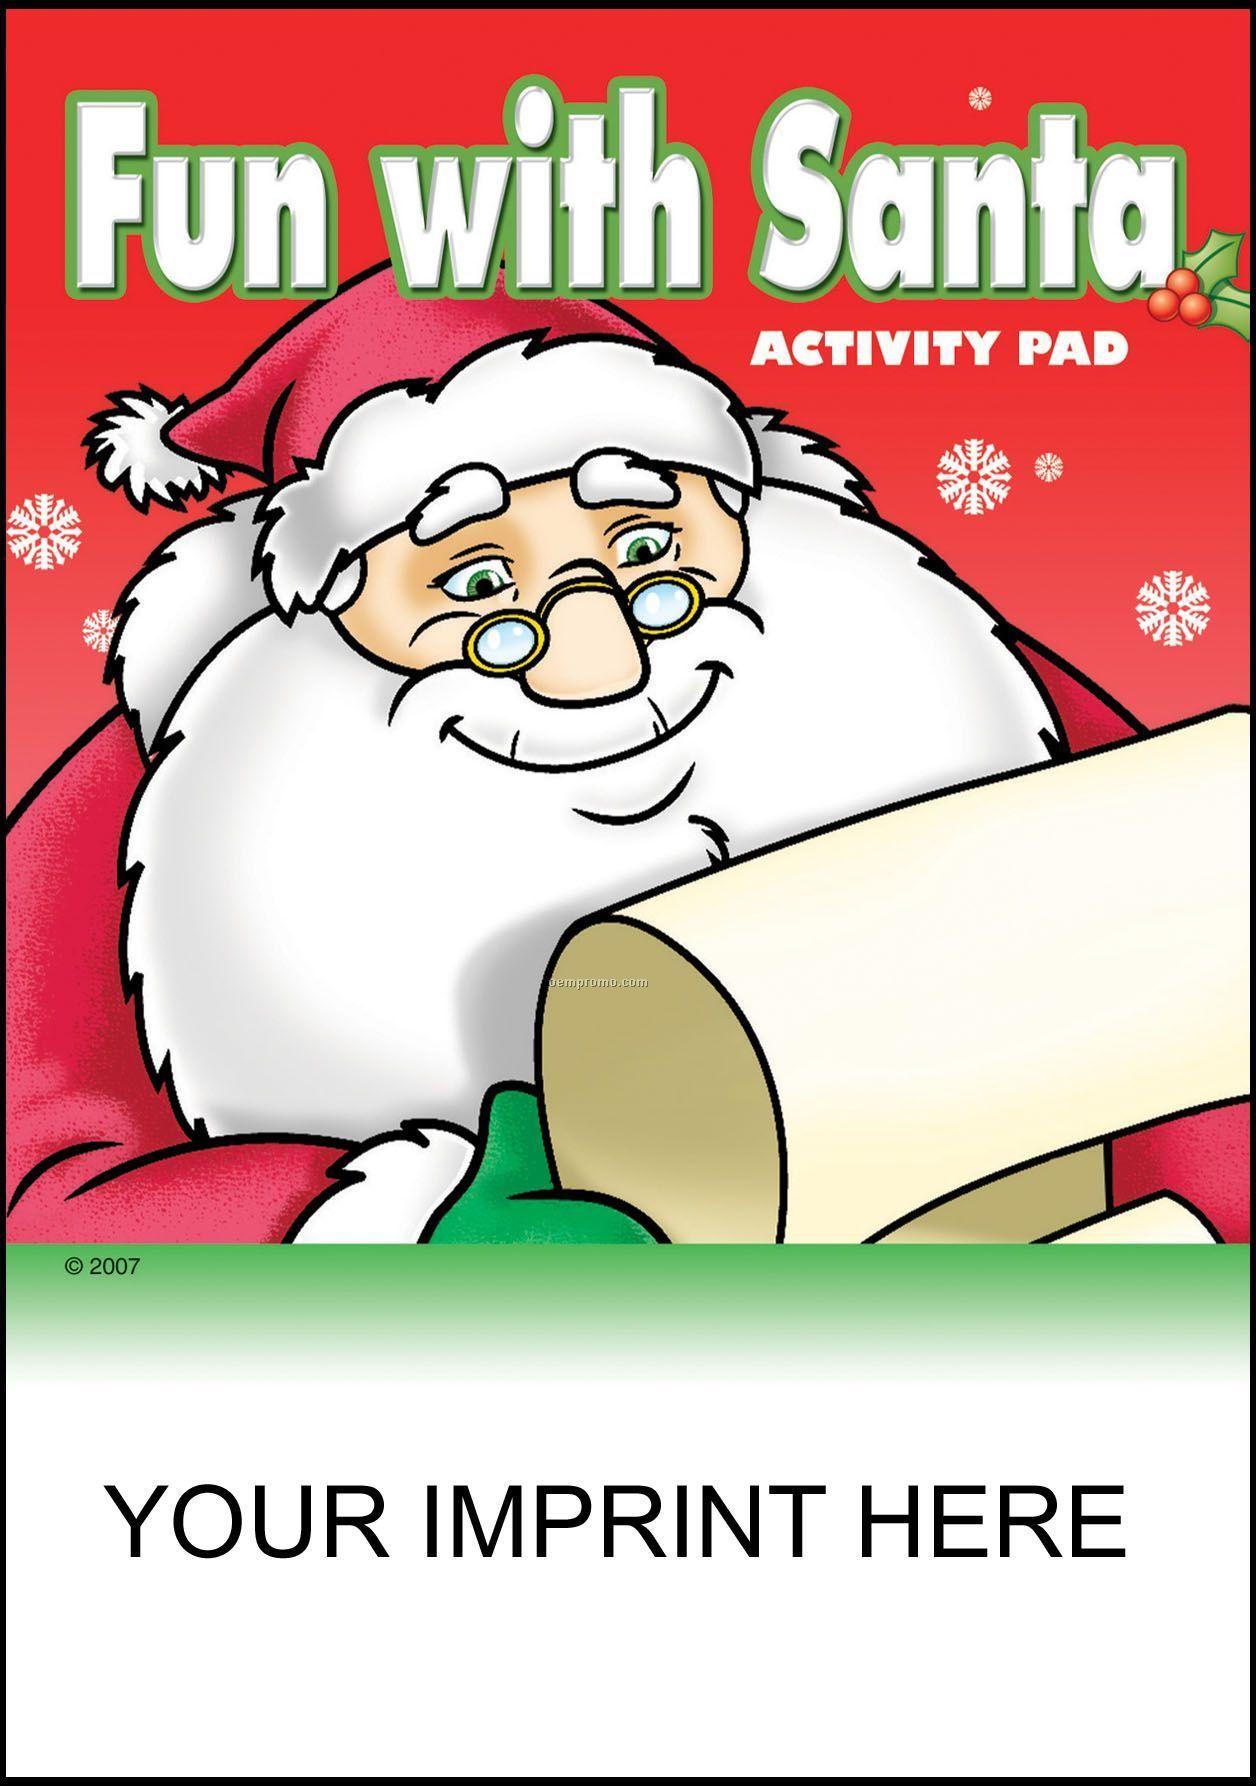 Fun With Santa Activity Pad - Santa With List